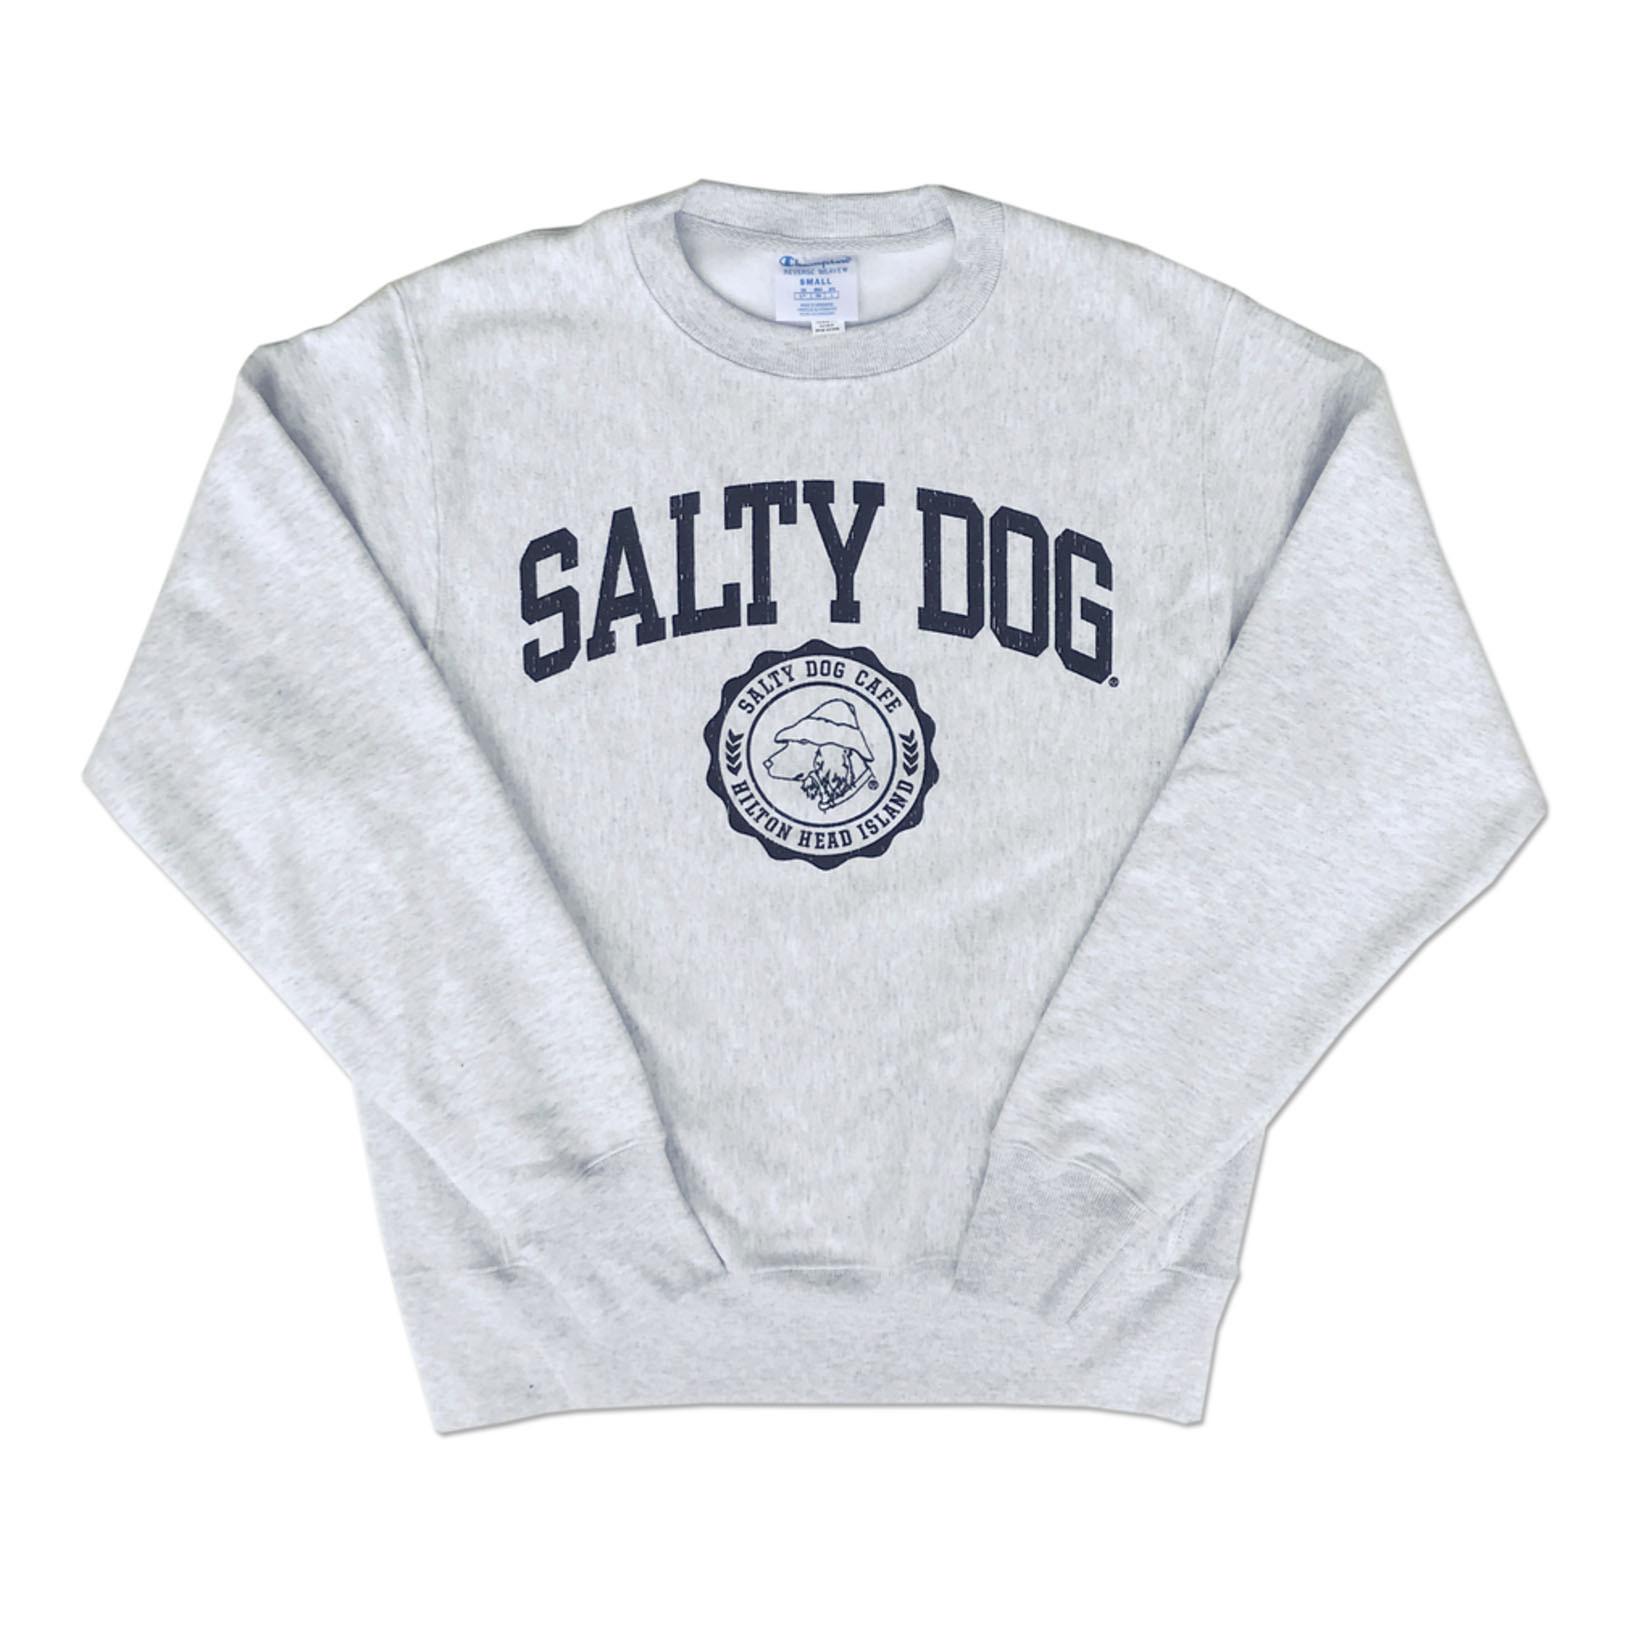 Sweatshirt-Youth Rev Weave Silver Grey